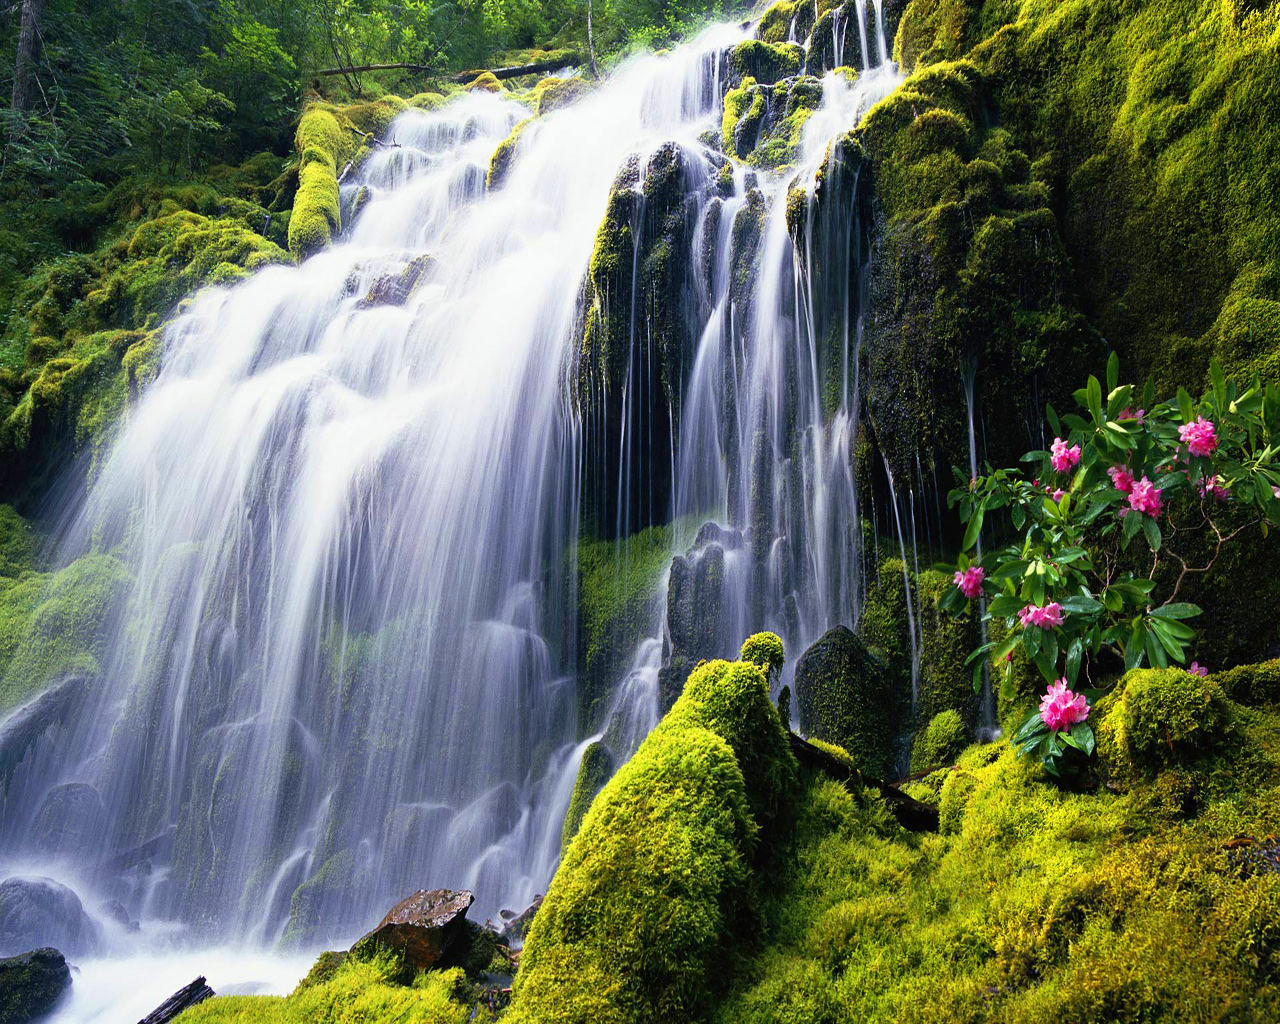 download wallpaper wallpaper waterfall download download 1280x1024